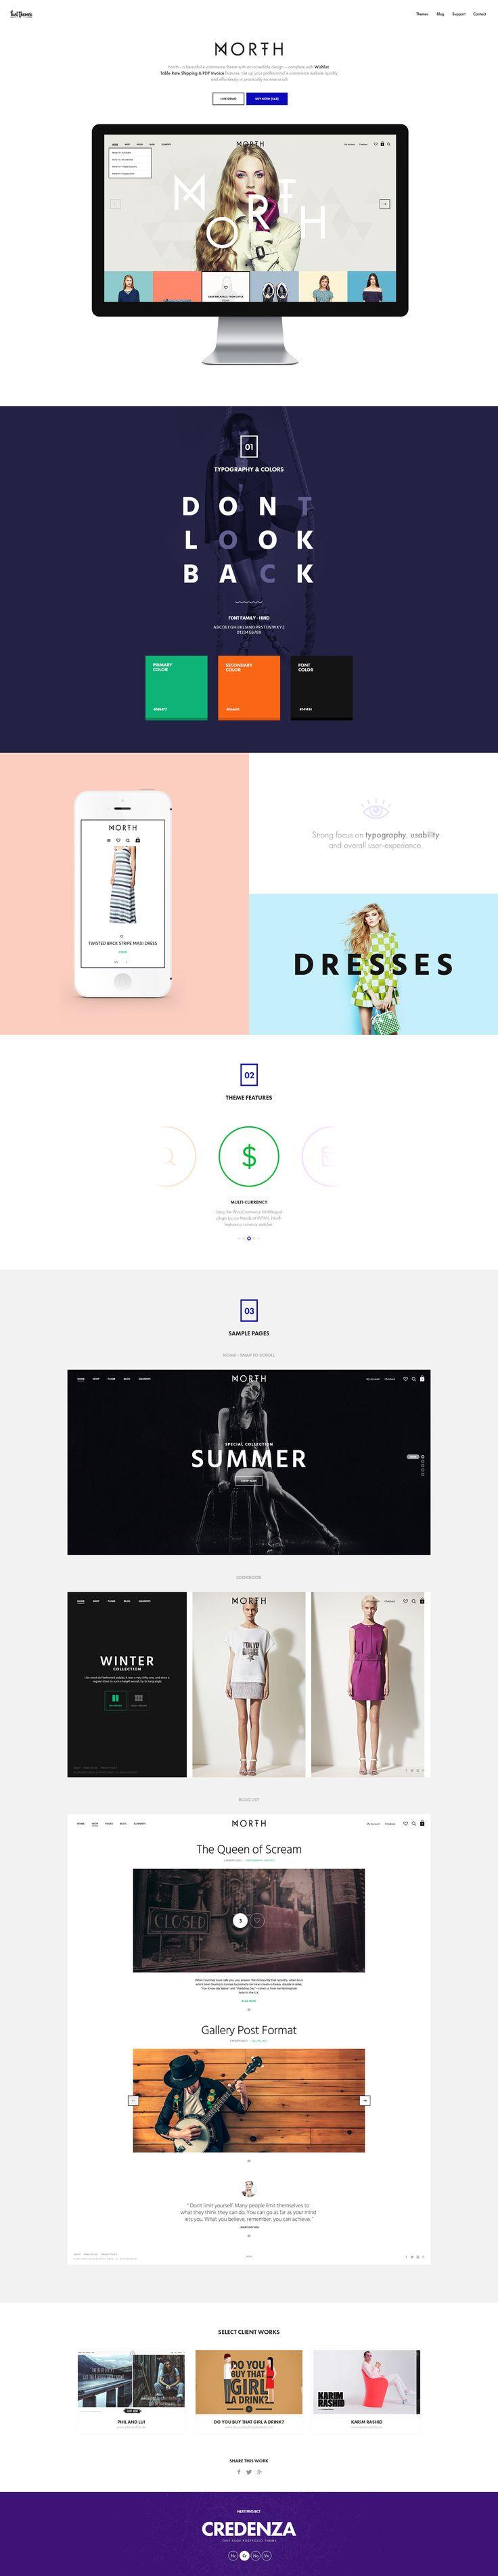 Dribbble social app ui design jpg by ramotion - Dribbble North_casestudy Jpg By Aykut Y Lmaz